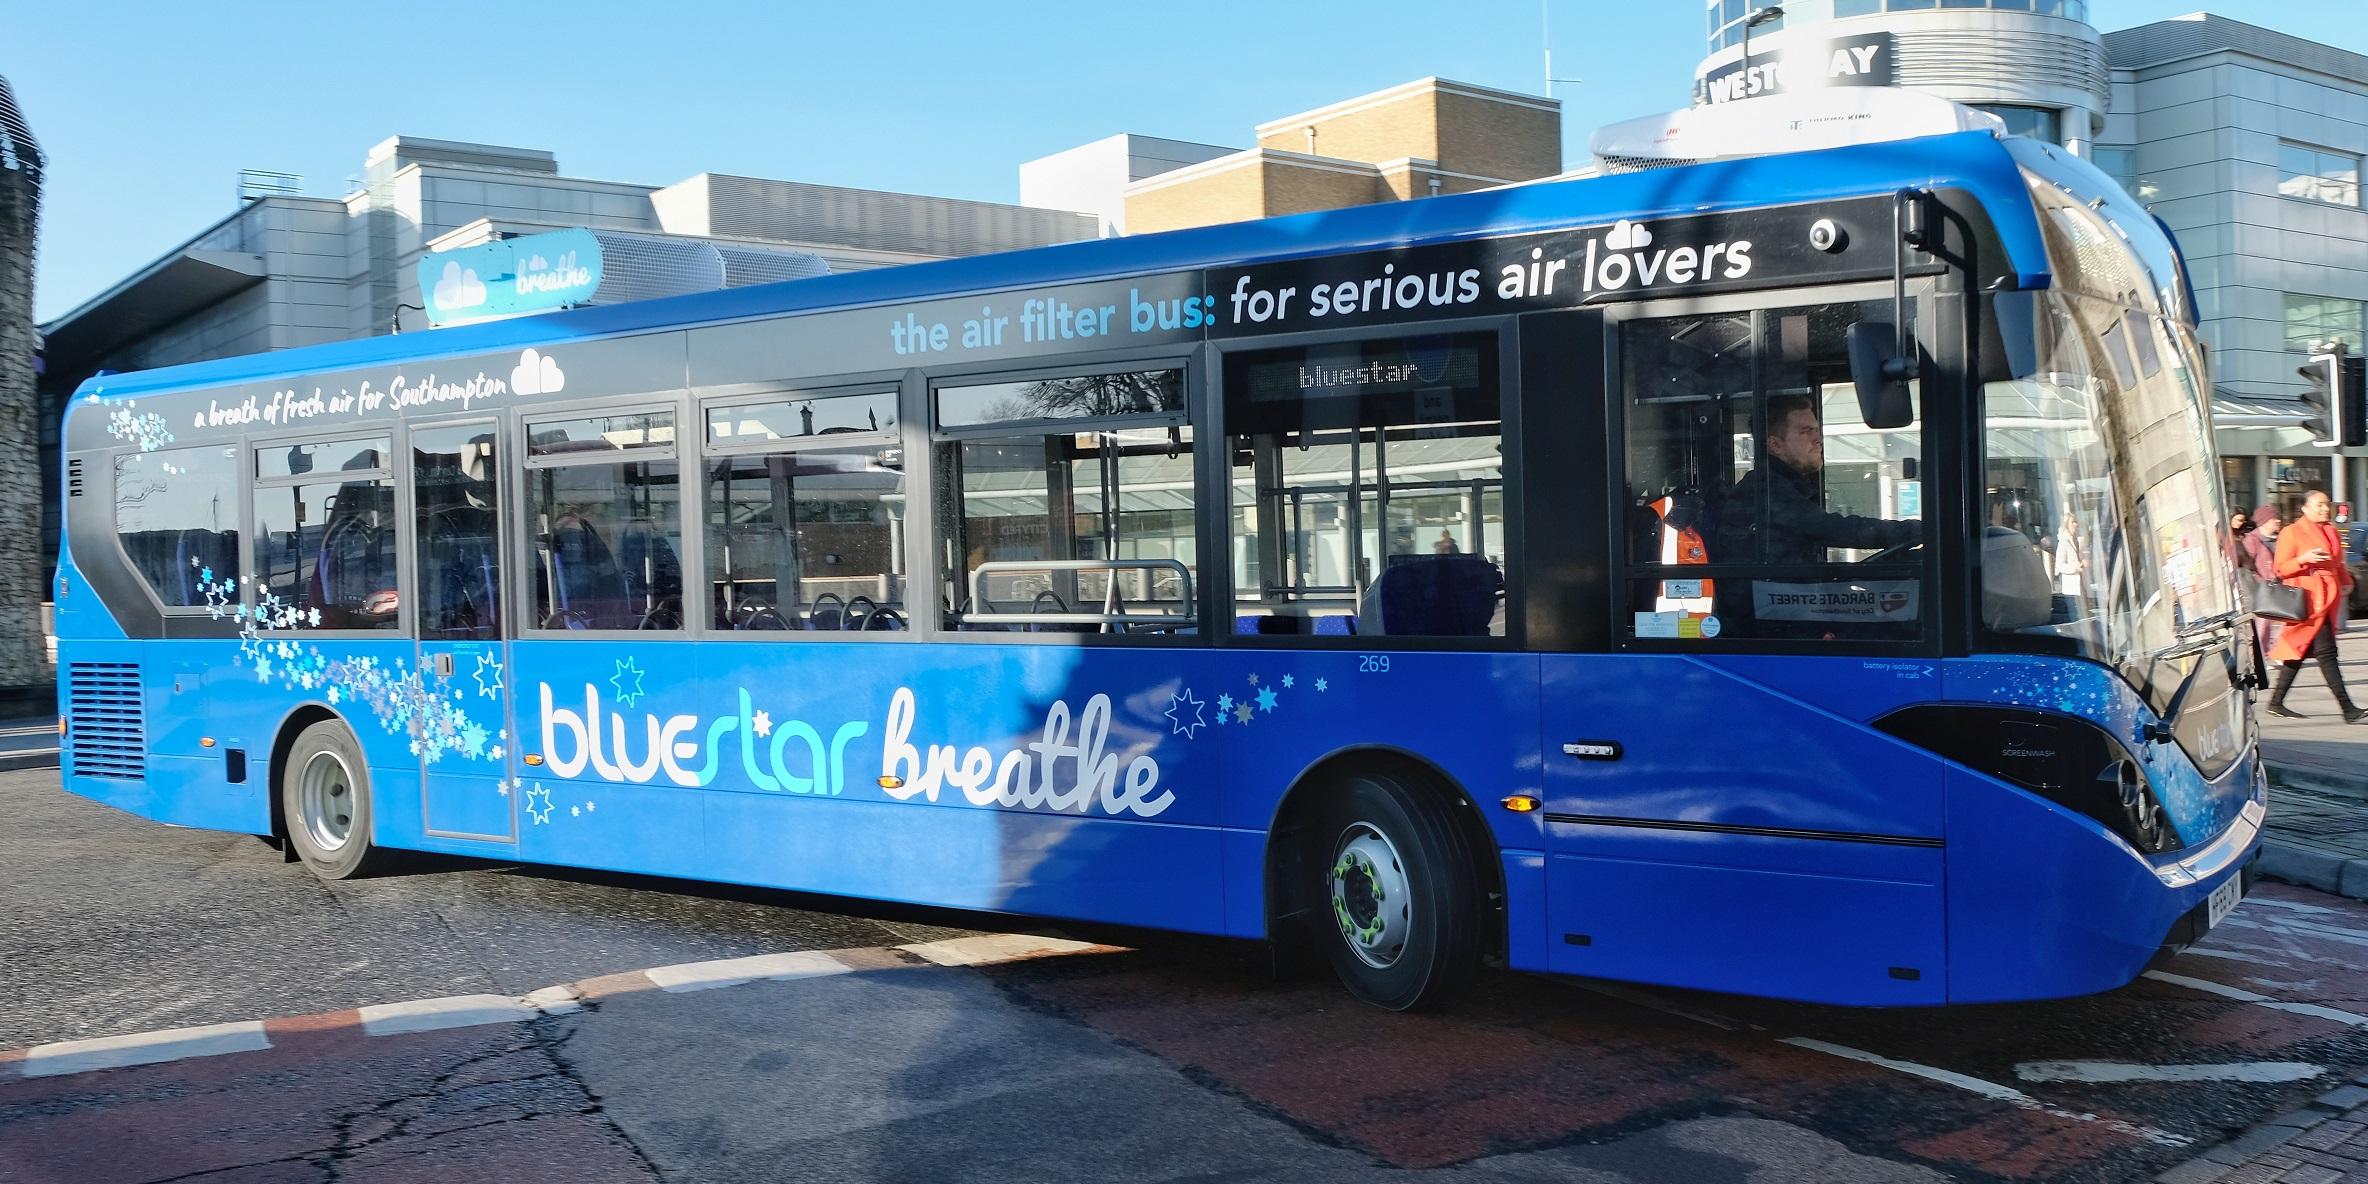 Bluestar Breathe Bus at Old Walls, Southampton